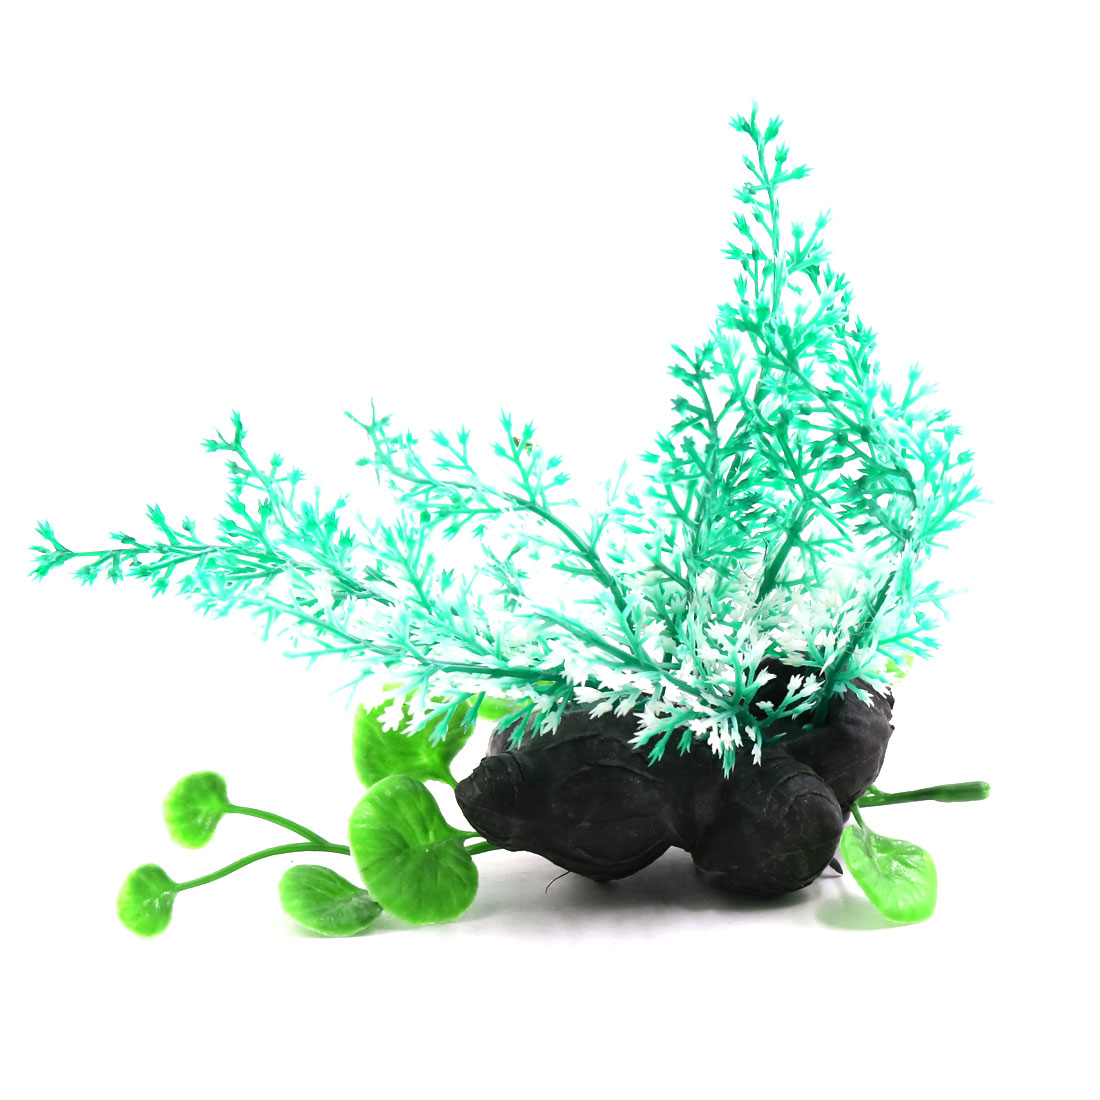 Mint Green Plastic Fish Tank Terrarium Plants Ornament for Reptiles w Ceramic Base